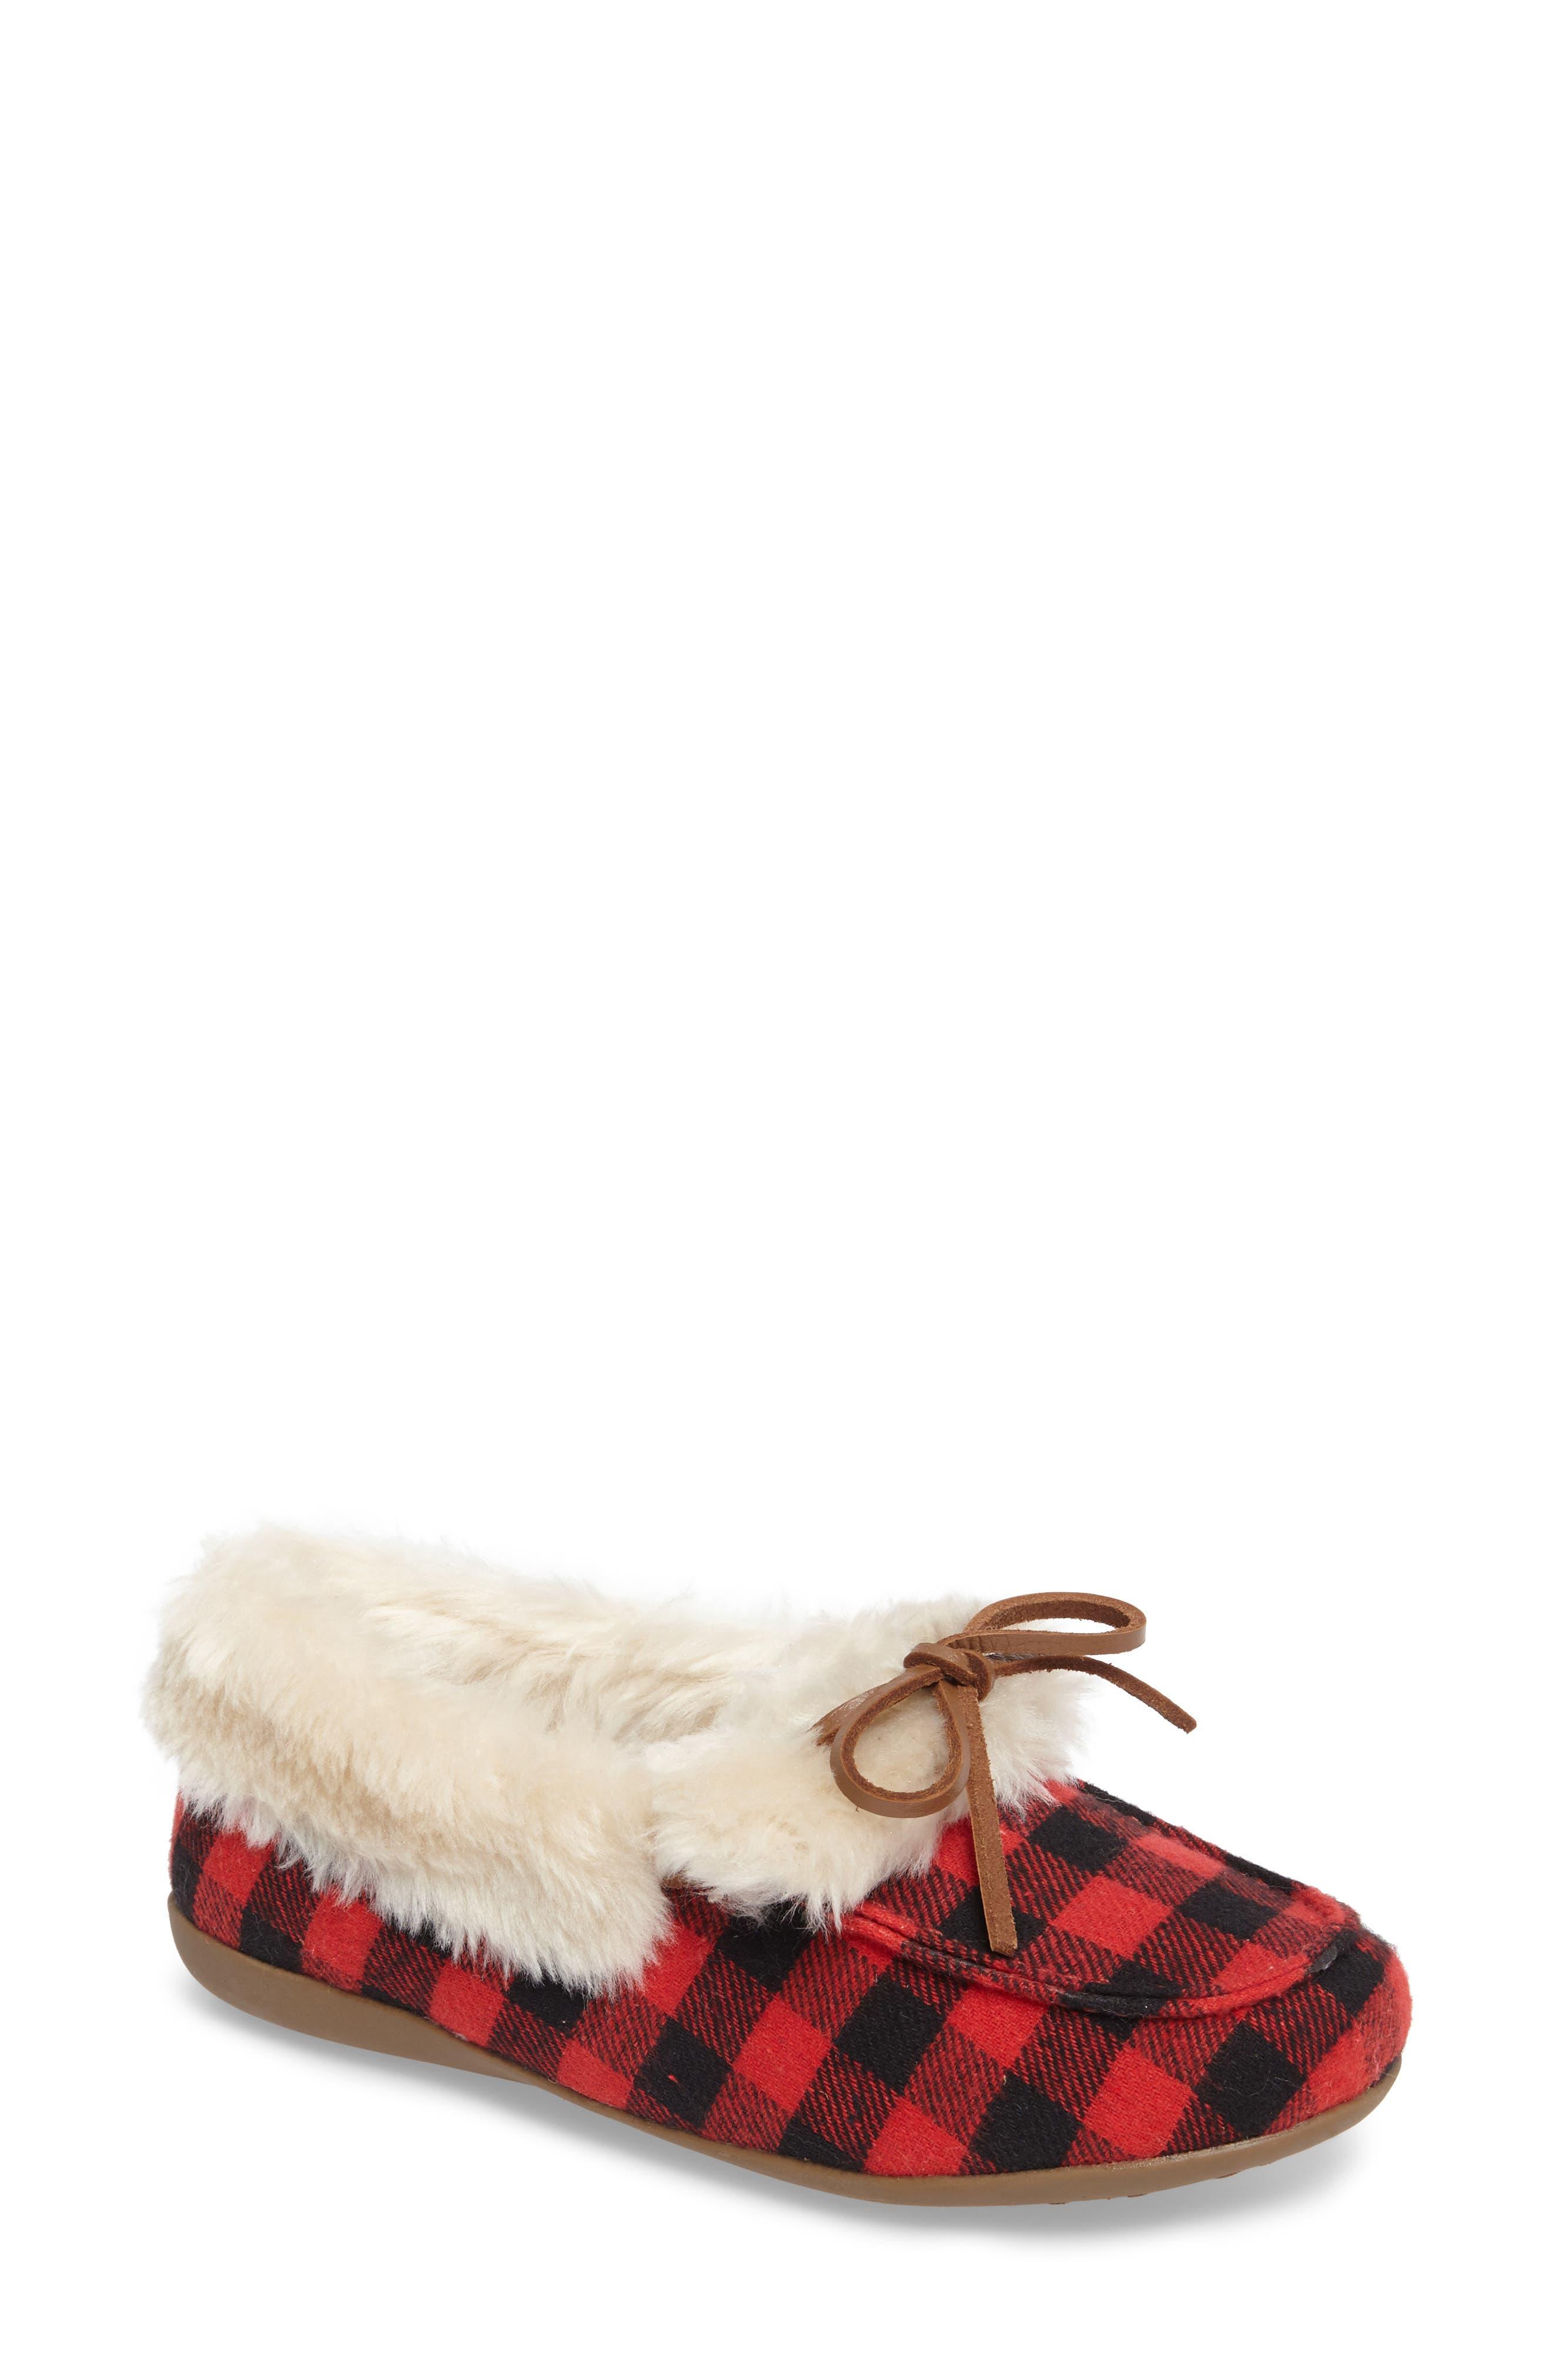 Alternate Image 1 Selected - Vionic Juniper Faux Fur Slipper (Women)